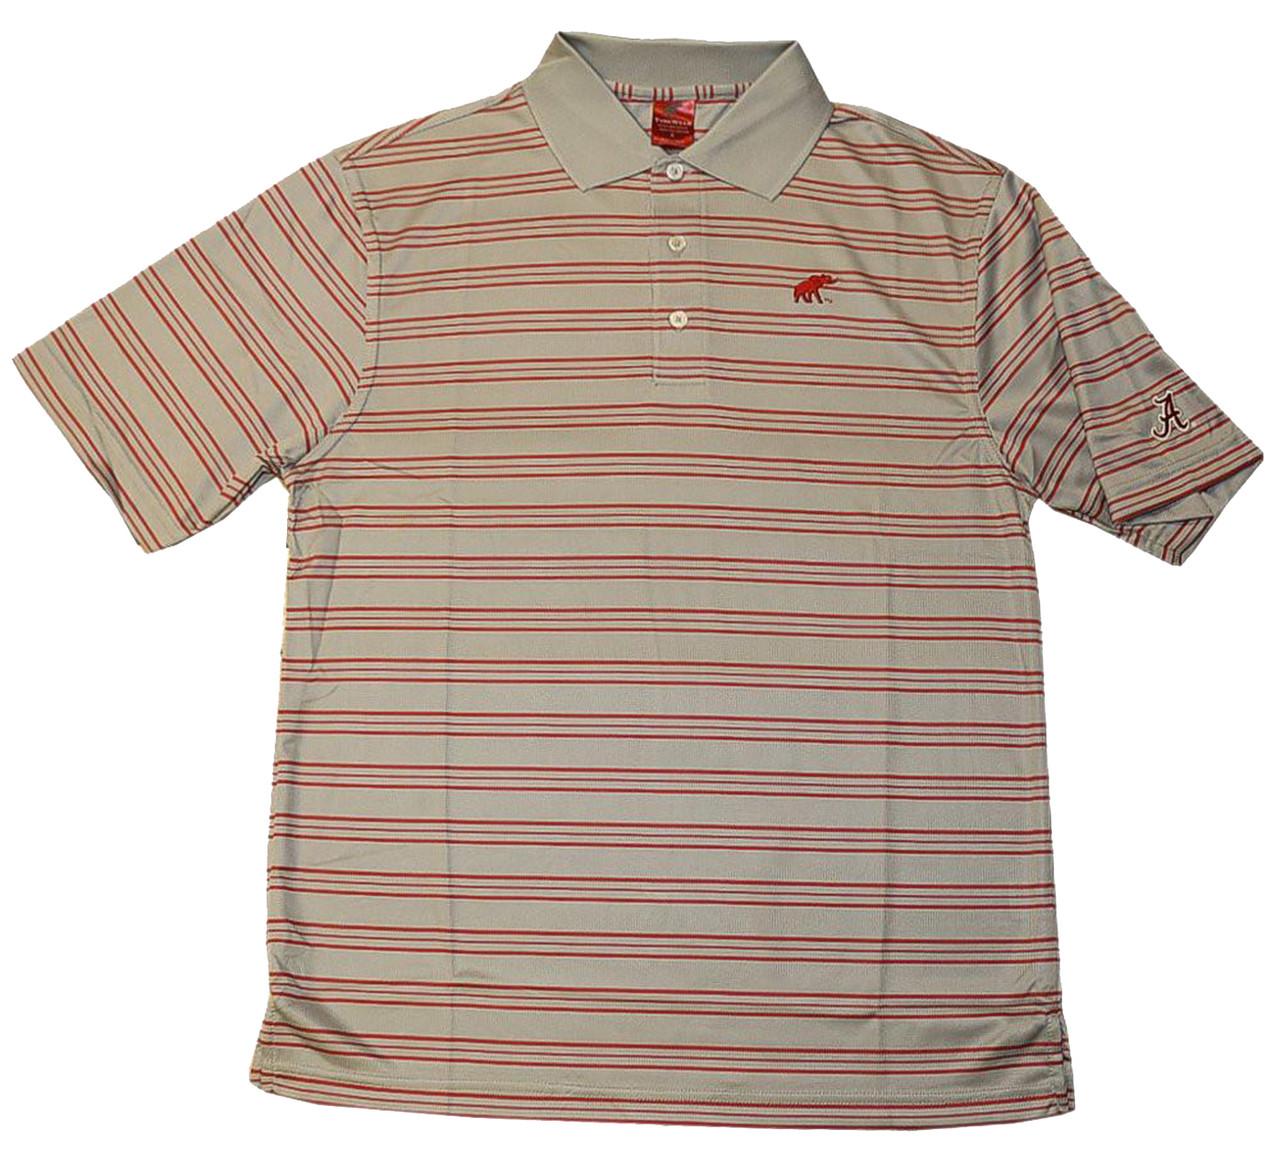 Southern Collegiate Apparel Alabama Crimson Tide Tailgate Short